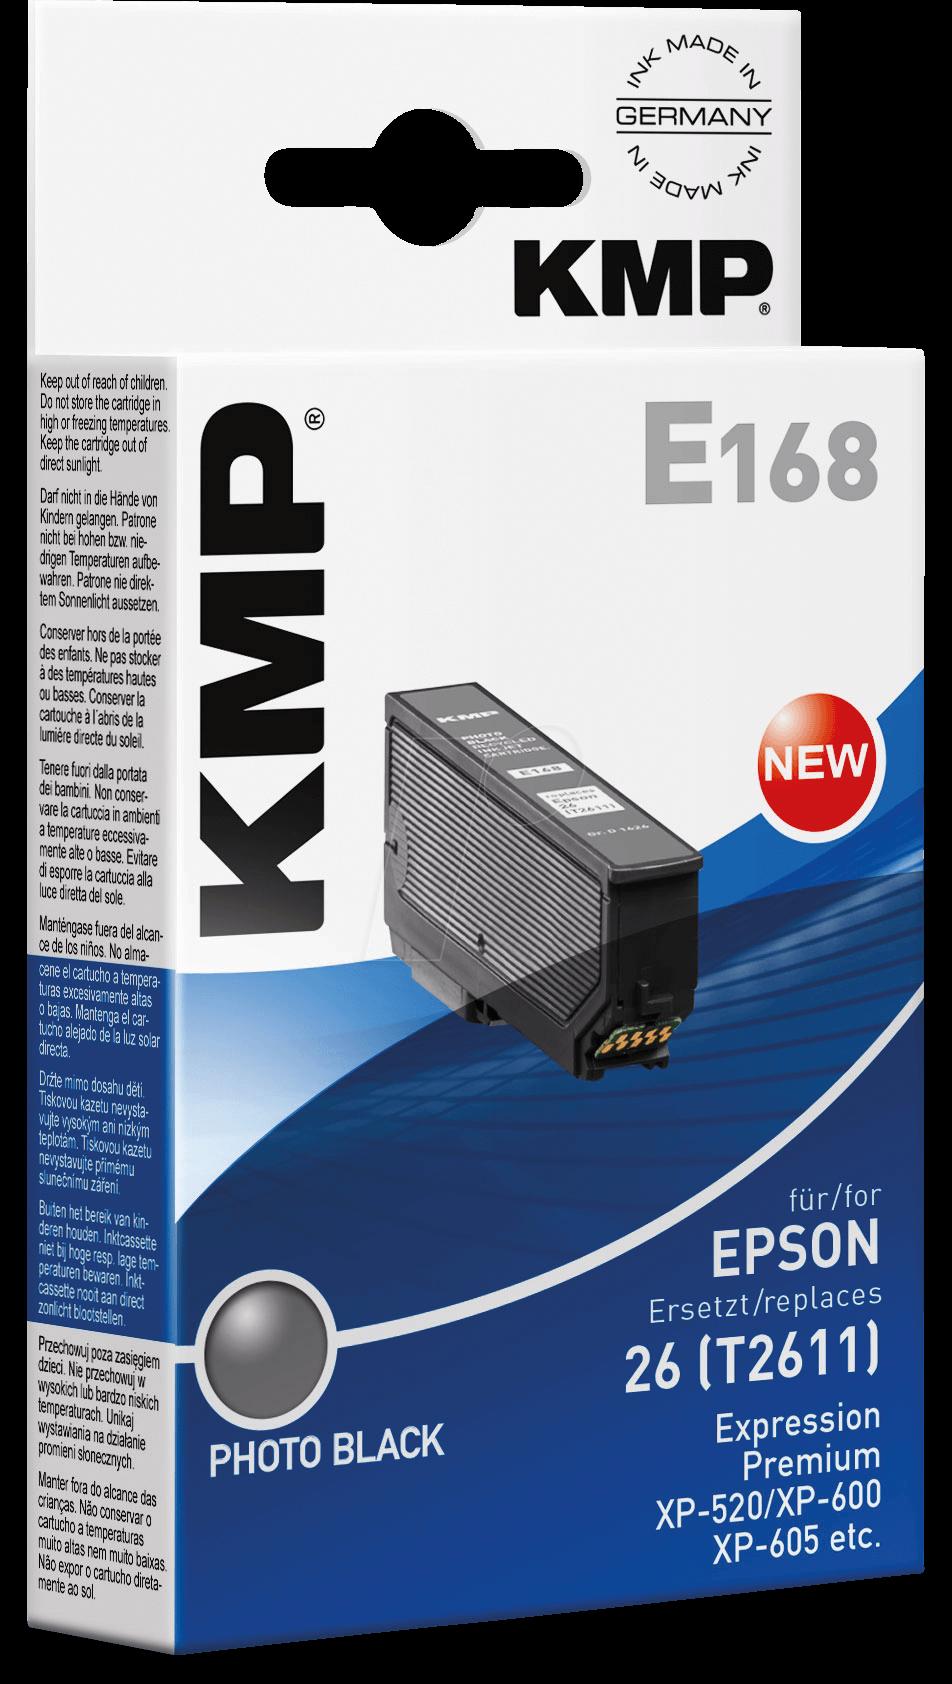 KMP 1626,4841 - Tinte - Epson - fotoschwarz - T2611 - refill